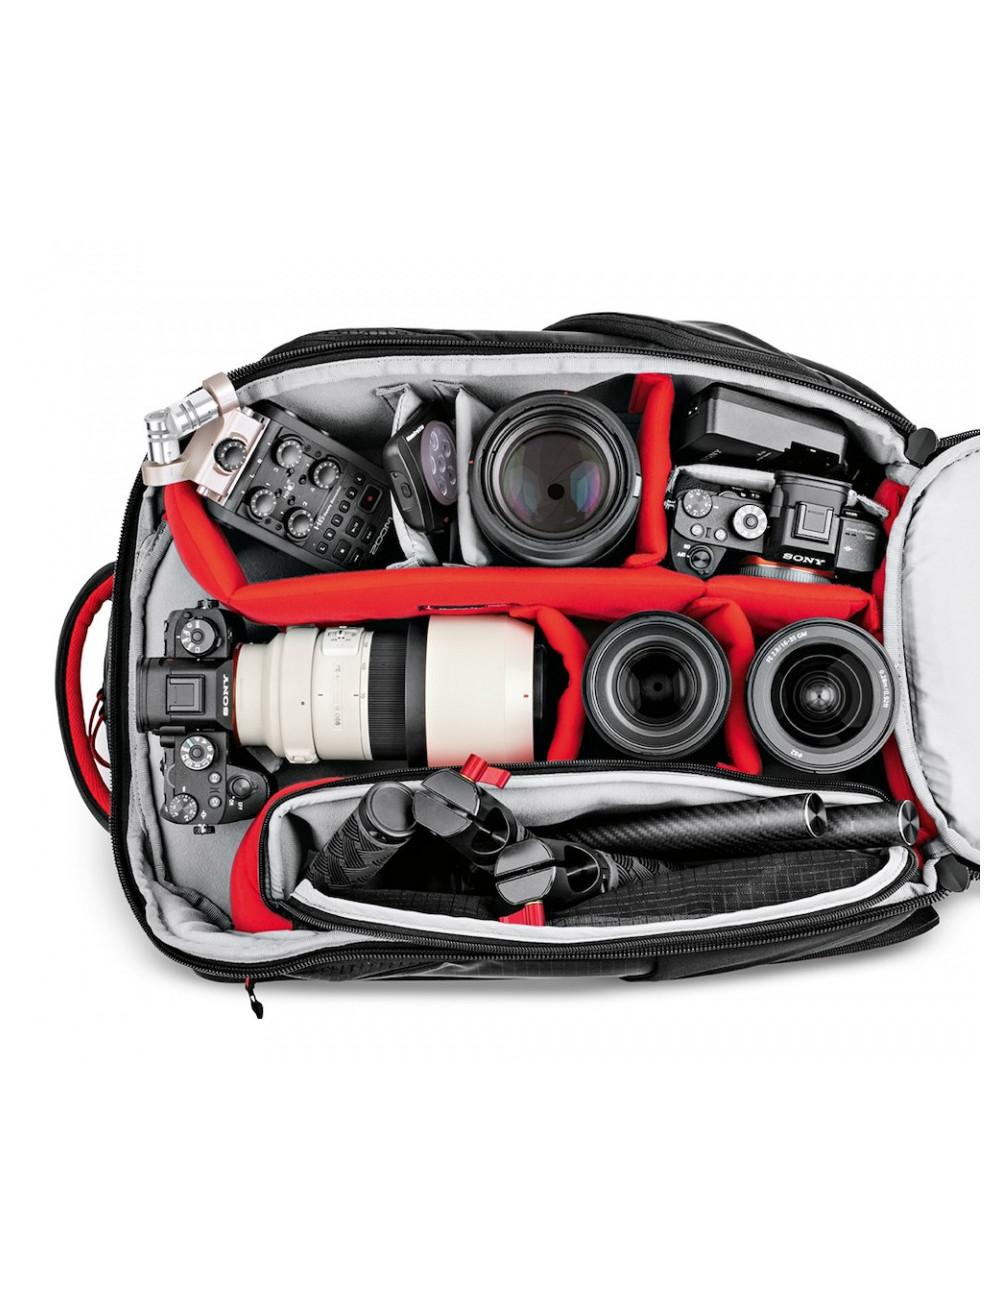 Rode Link Performer Kit Micrófono Inalámbrico de Mano - Para escenarios, conferencias, sala de clases